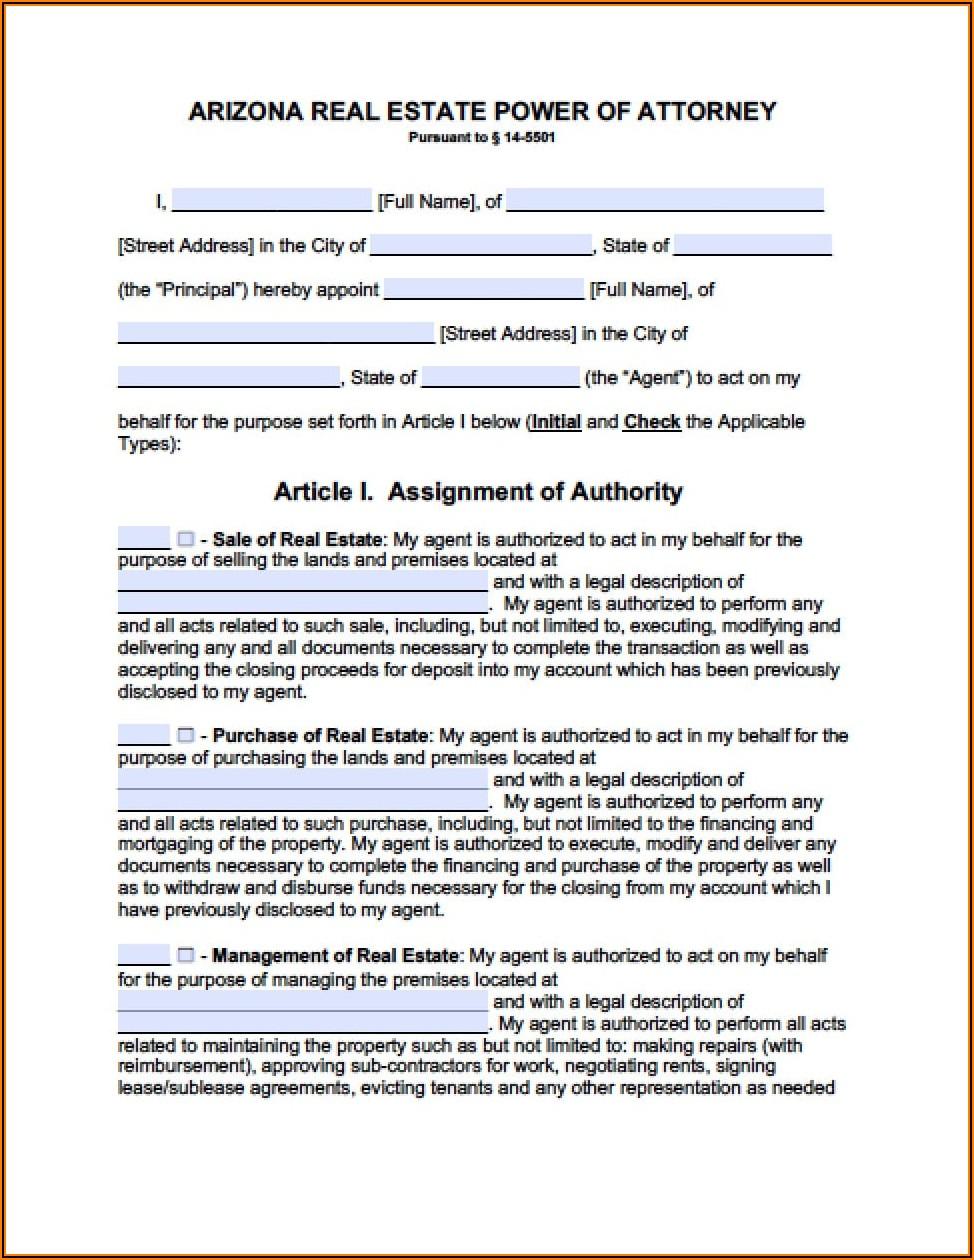 Az Medical Power Of Attorney Form